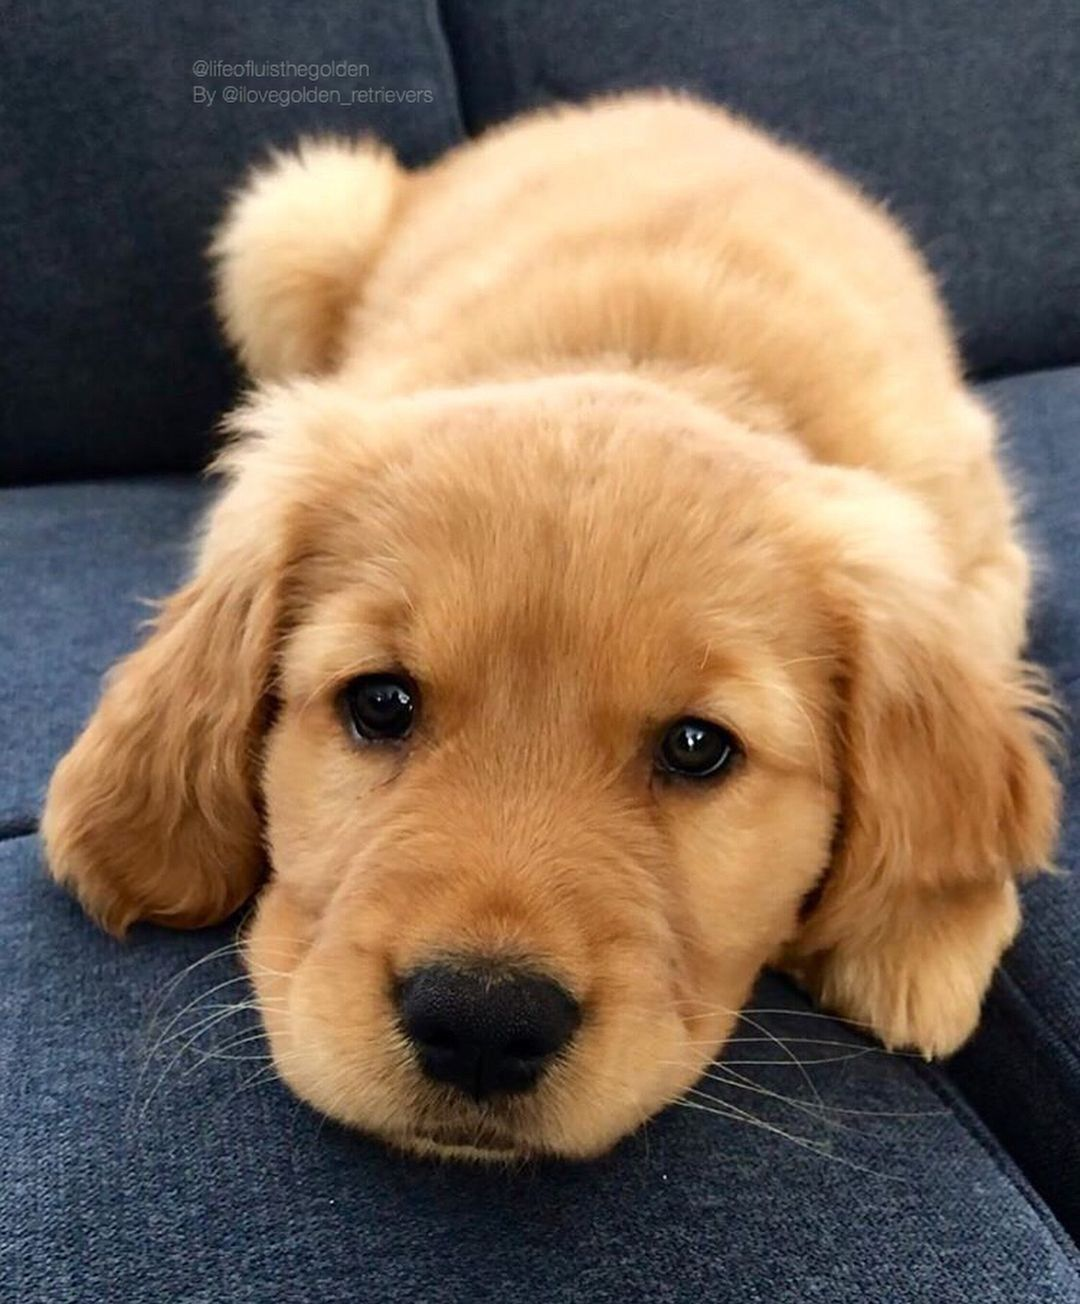 19 6k Likes 171 Comments I Love Golden Retrievers Ilovegolden Retrievers On Instagram Um Ho Golden Retriever Baby Retriever Puppy Dogs Golden Retriever